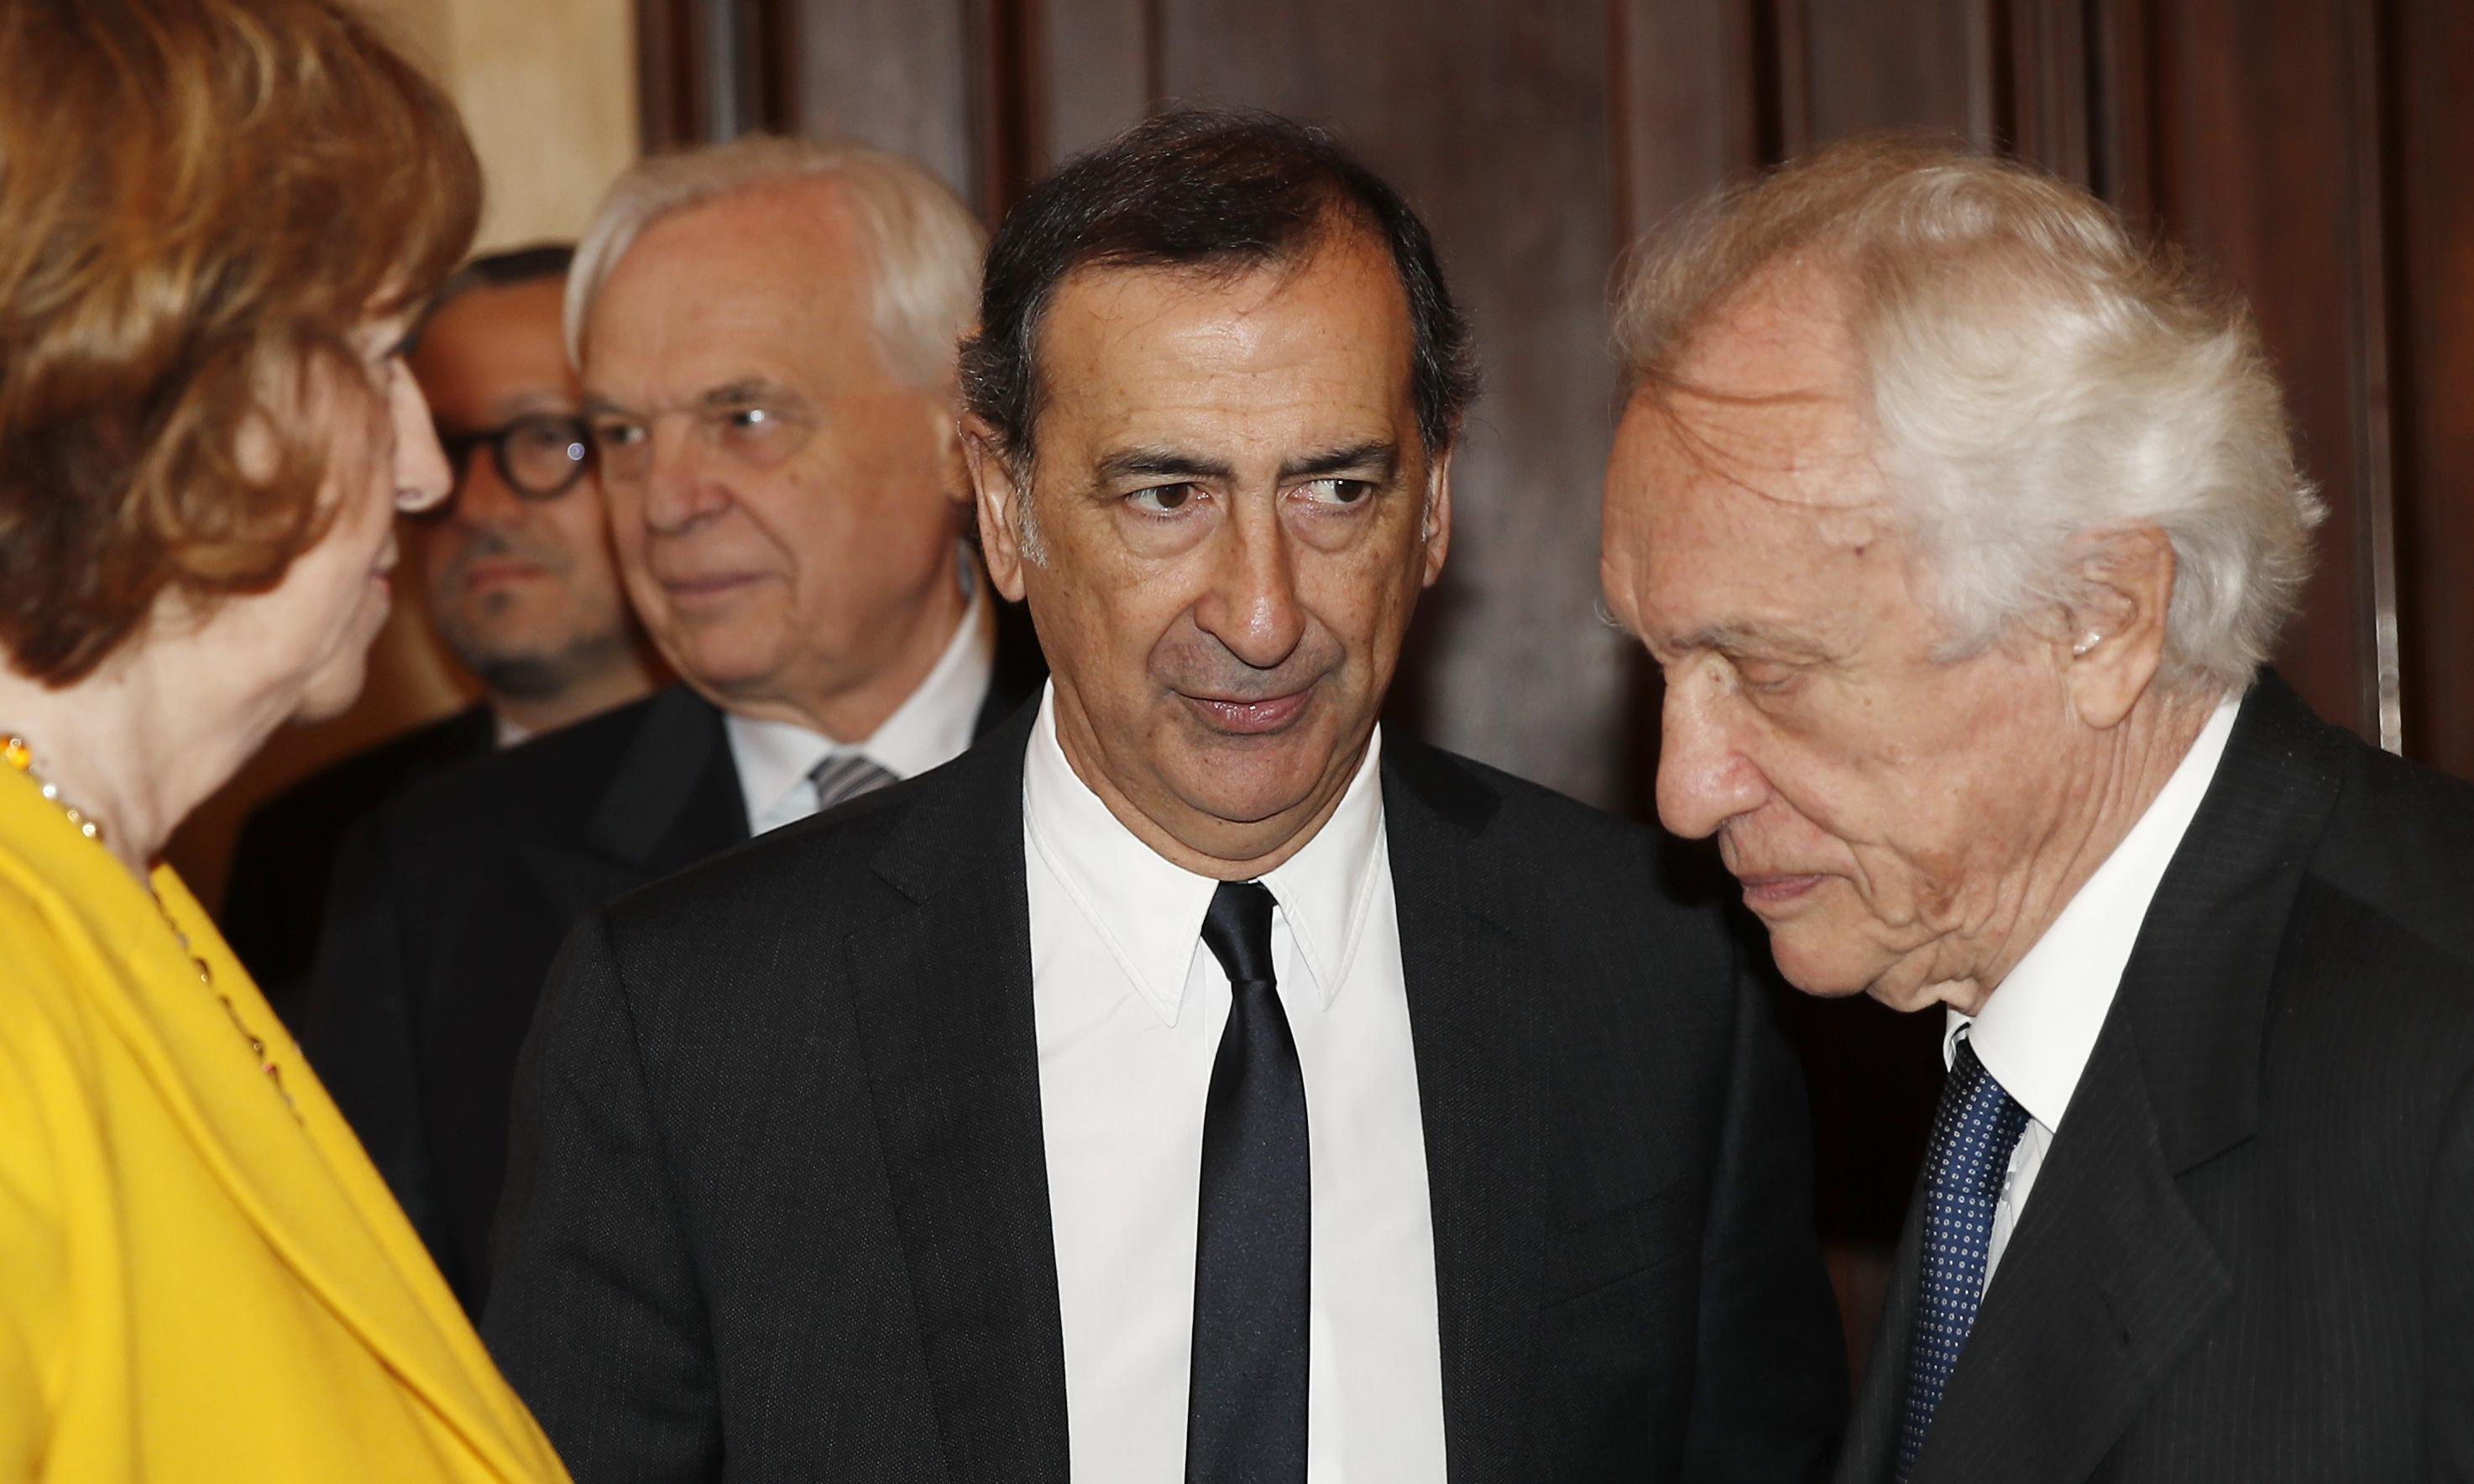 La Scala opera house to return Saudi donation of €3m after outcry